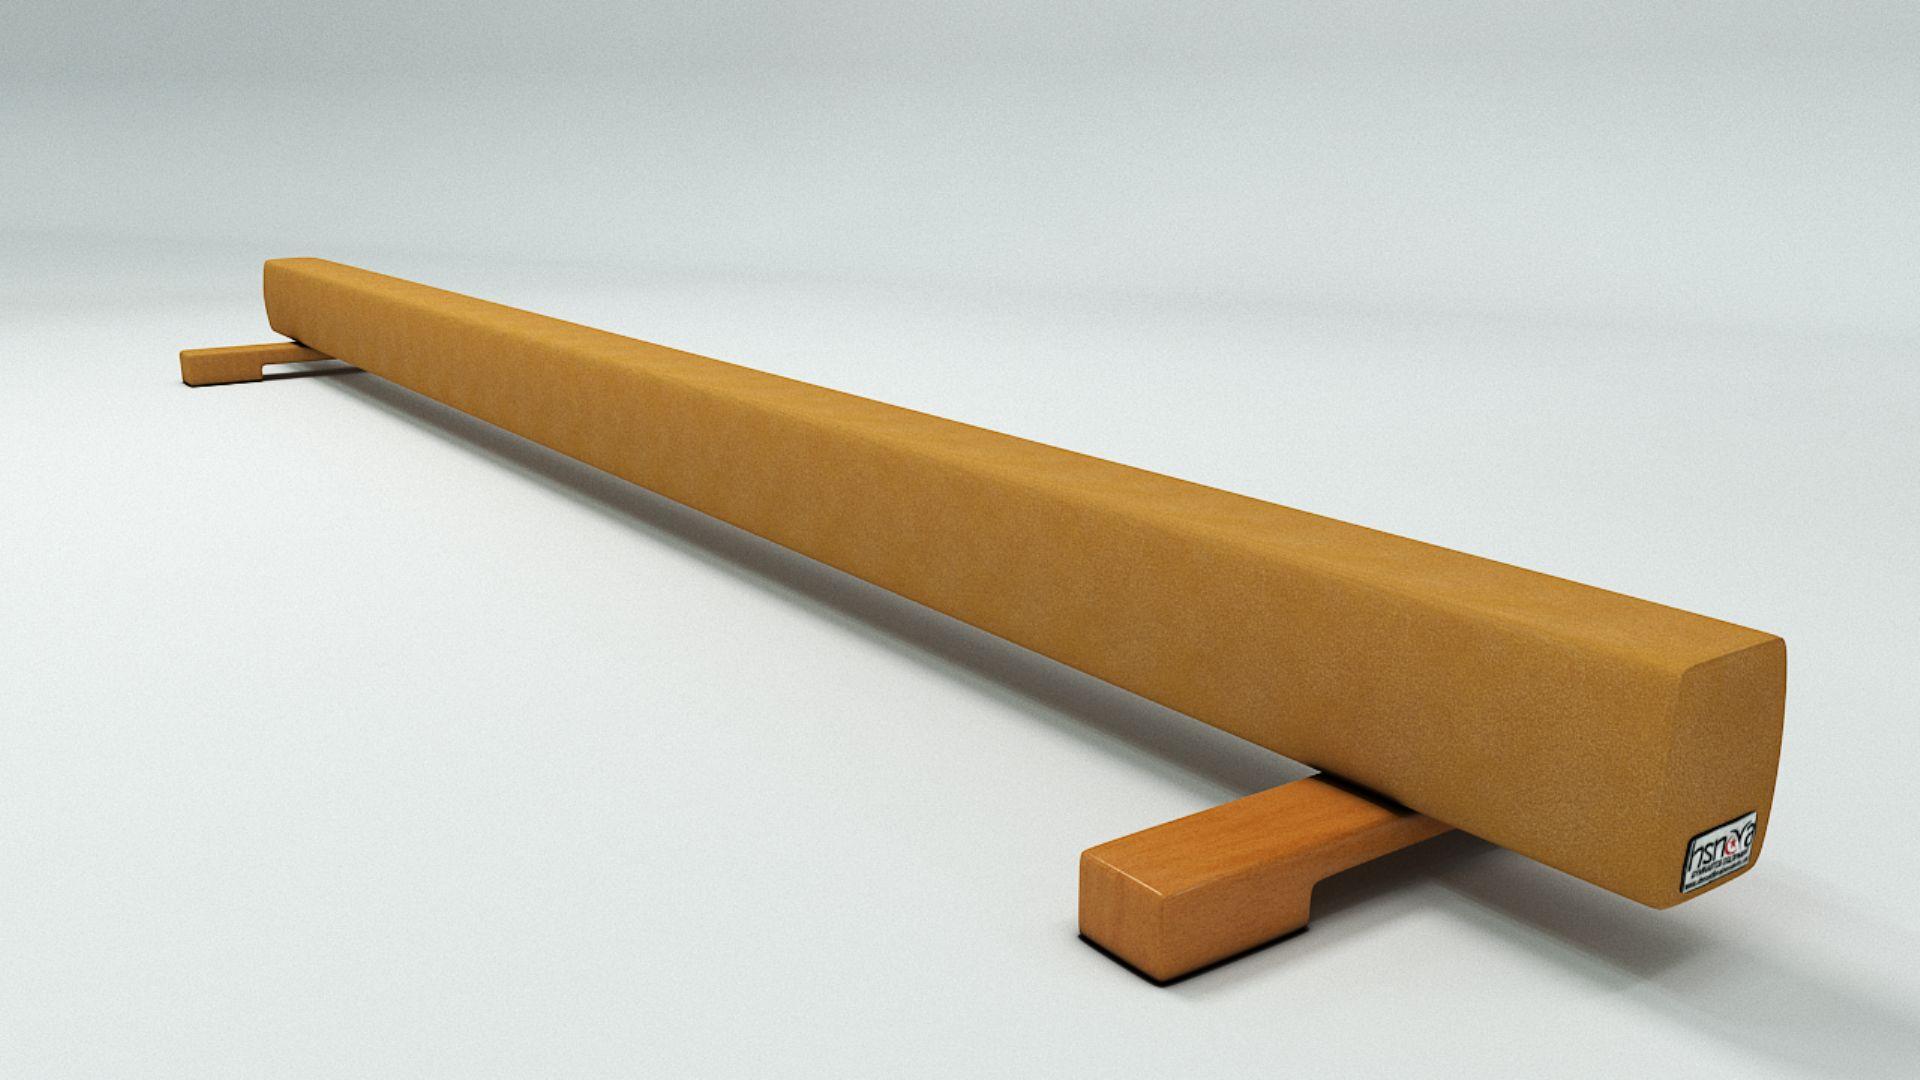 AHŞAP DENGE DERİ KAPLAMALI 3metre  yer dengesi